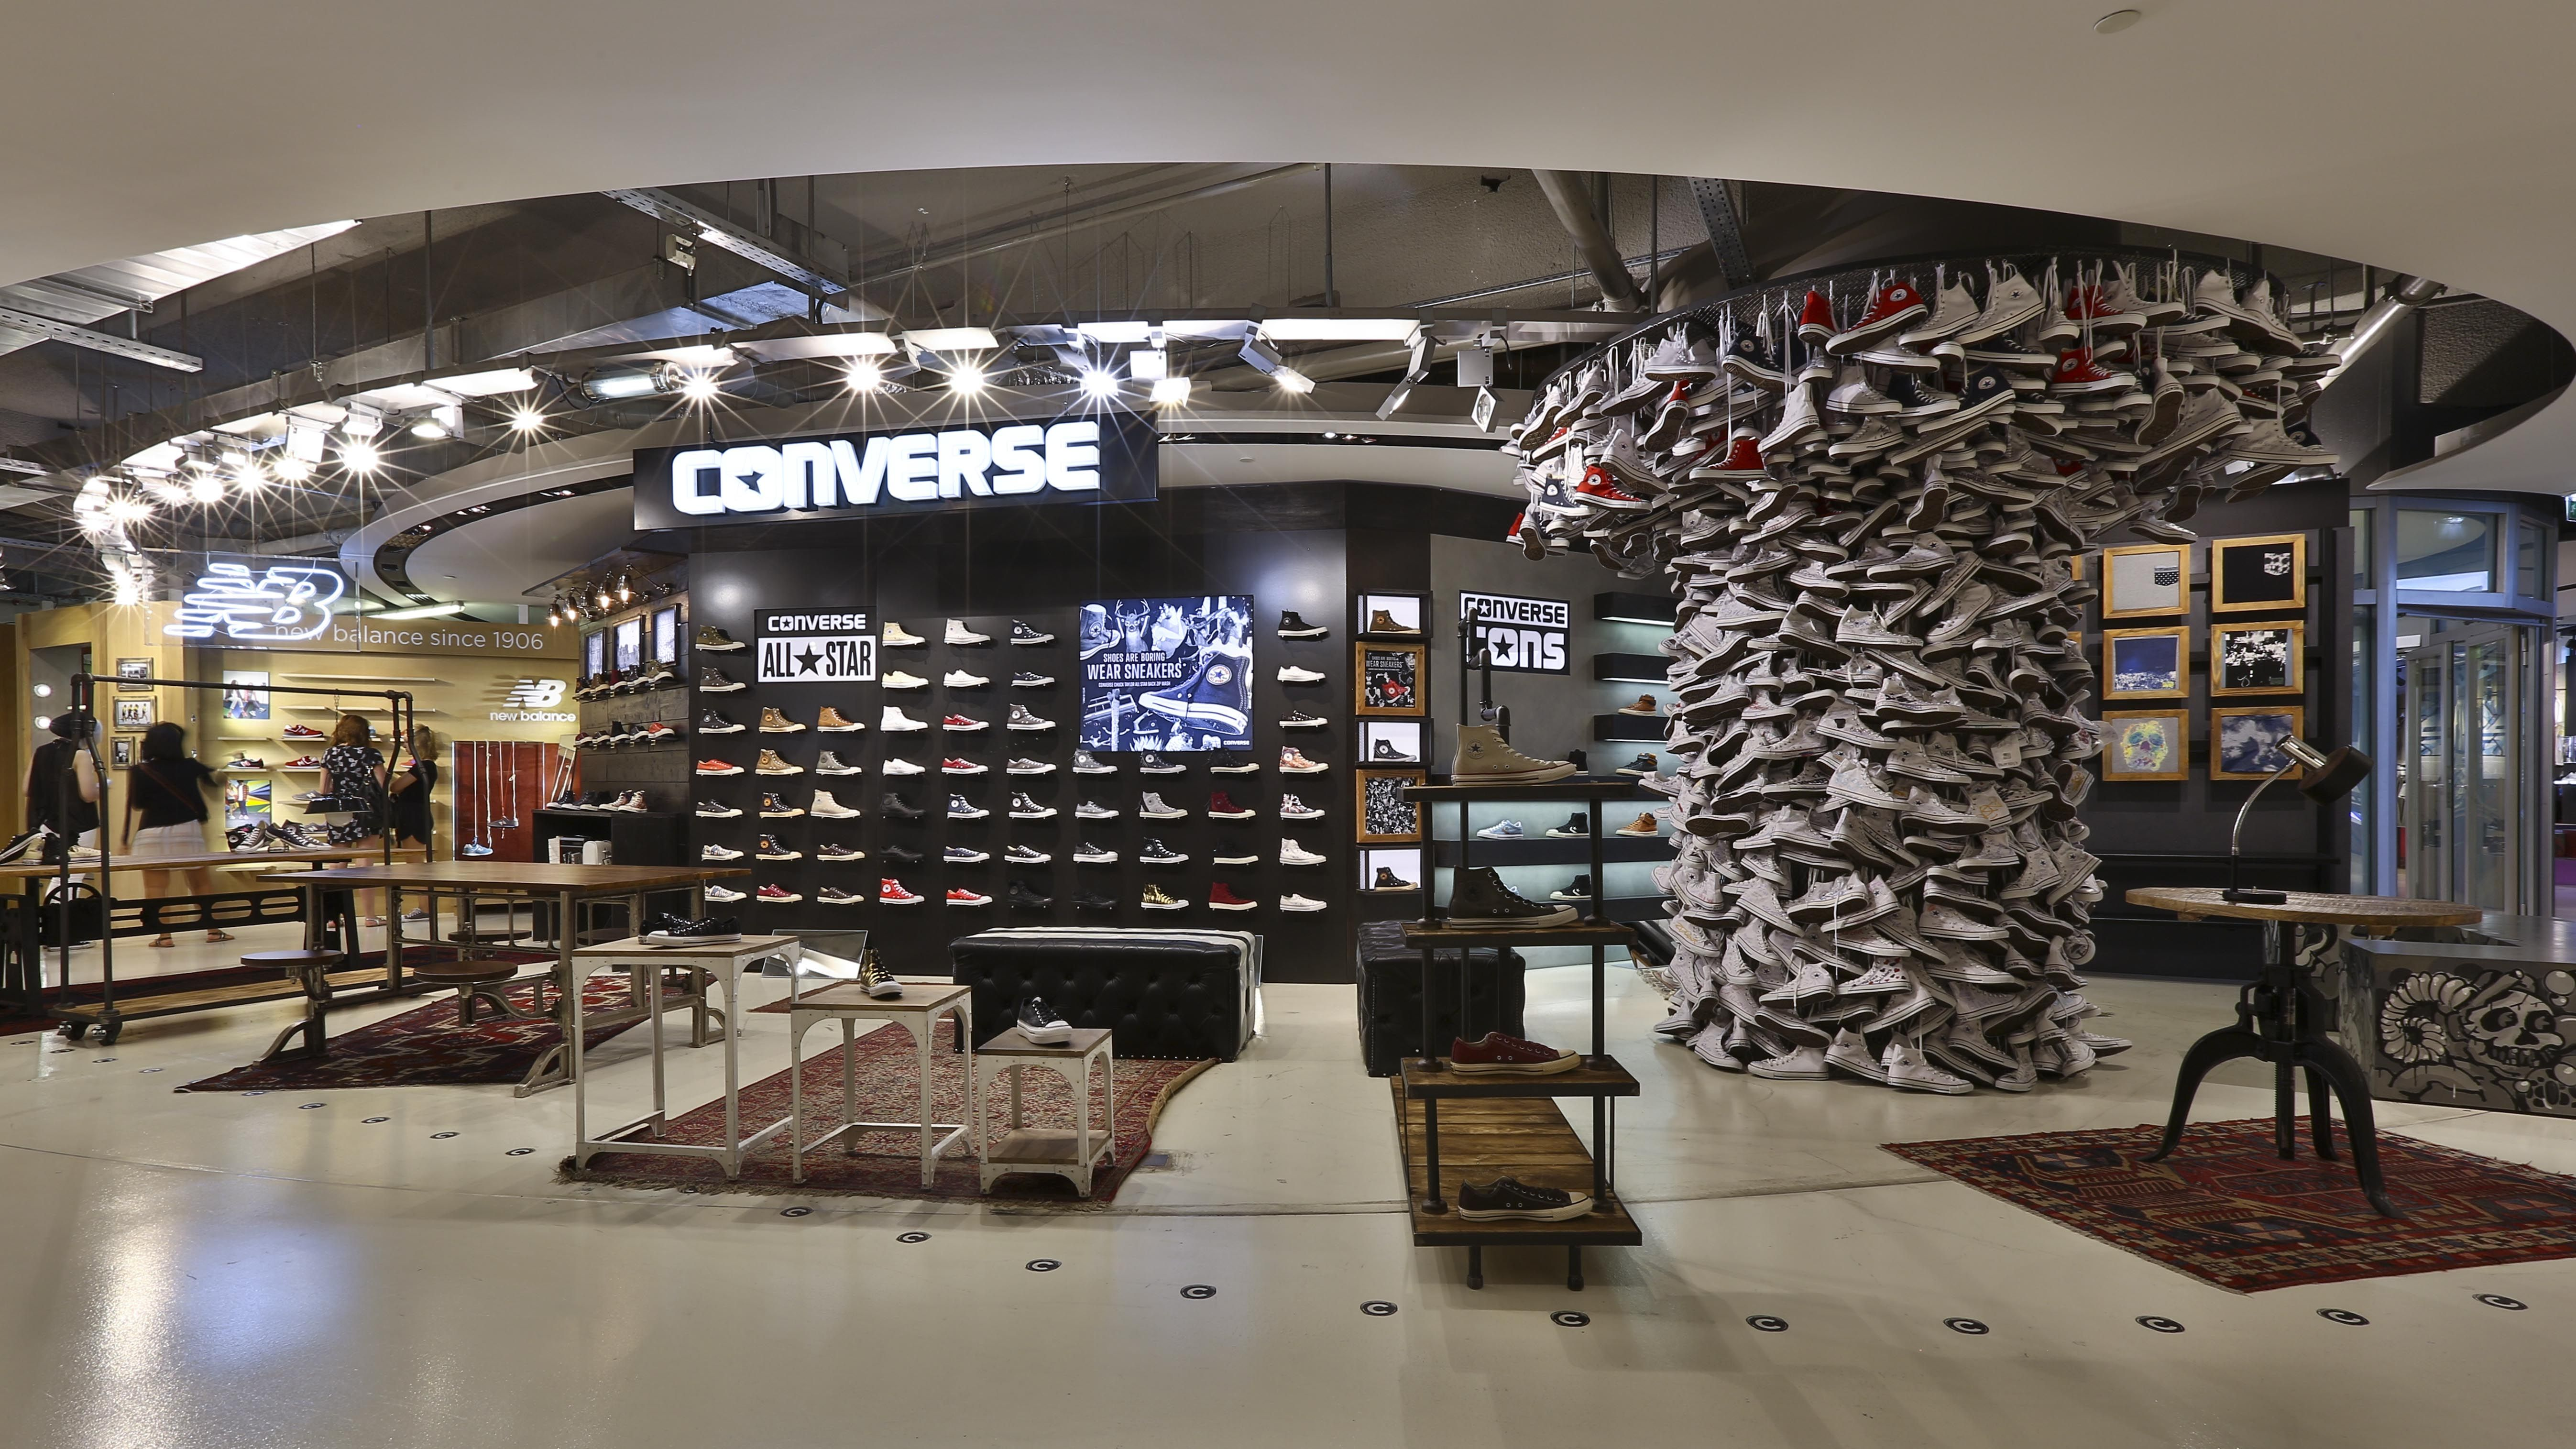 Converse | Converse, Broadway shows, Corner